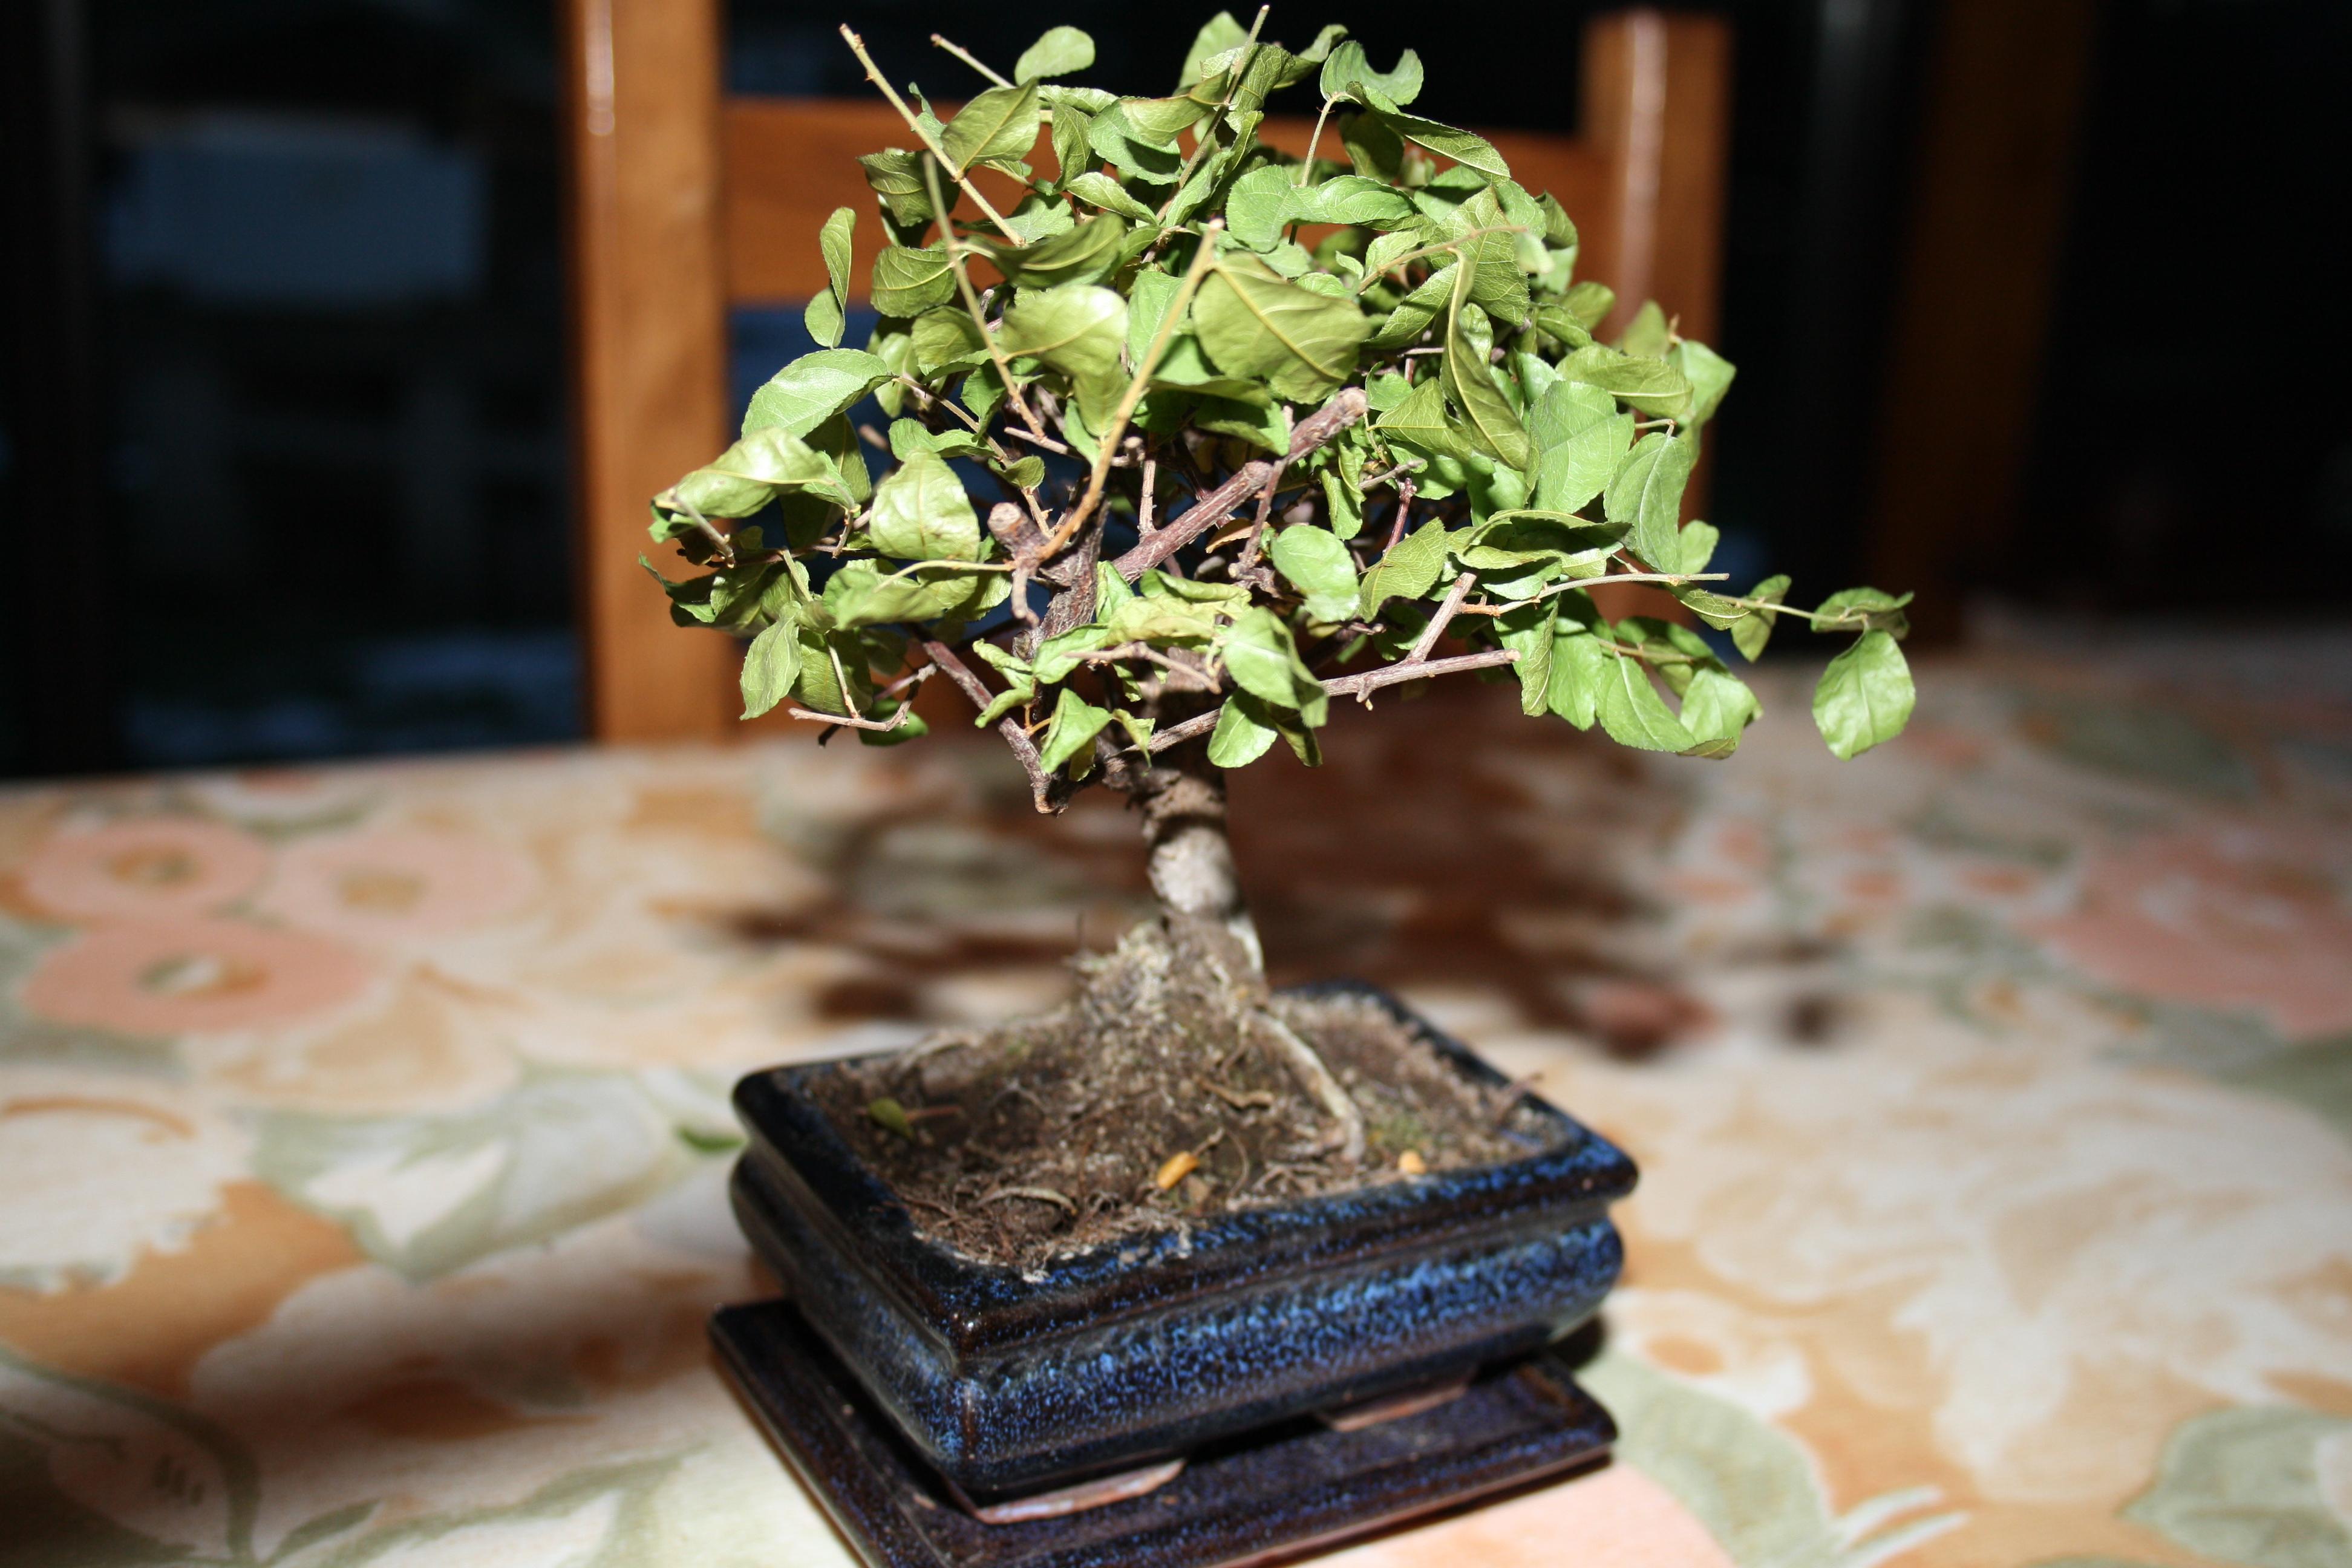 mon bonsai perd ses feuilles – secretstoeating